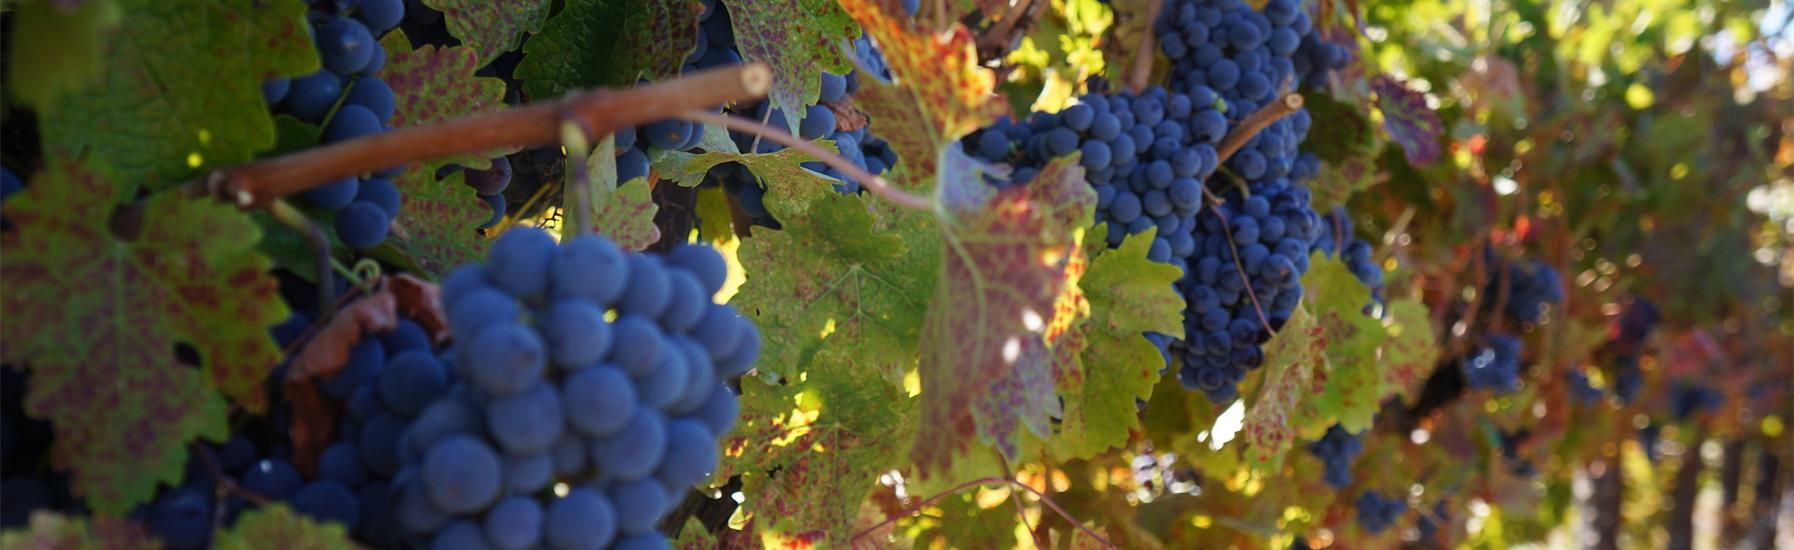 Grapes panel